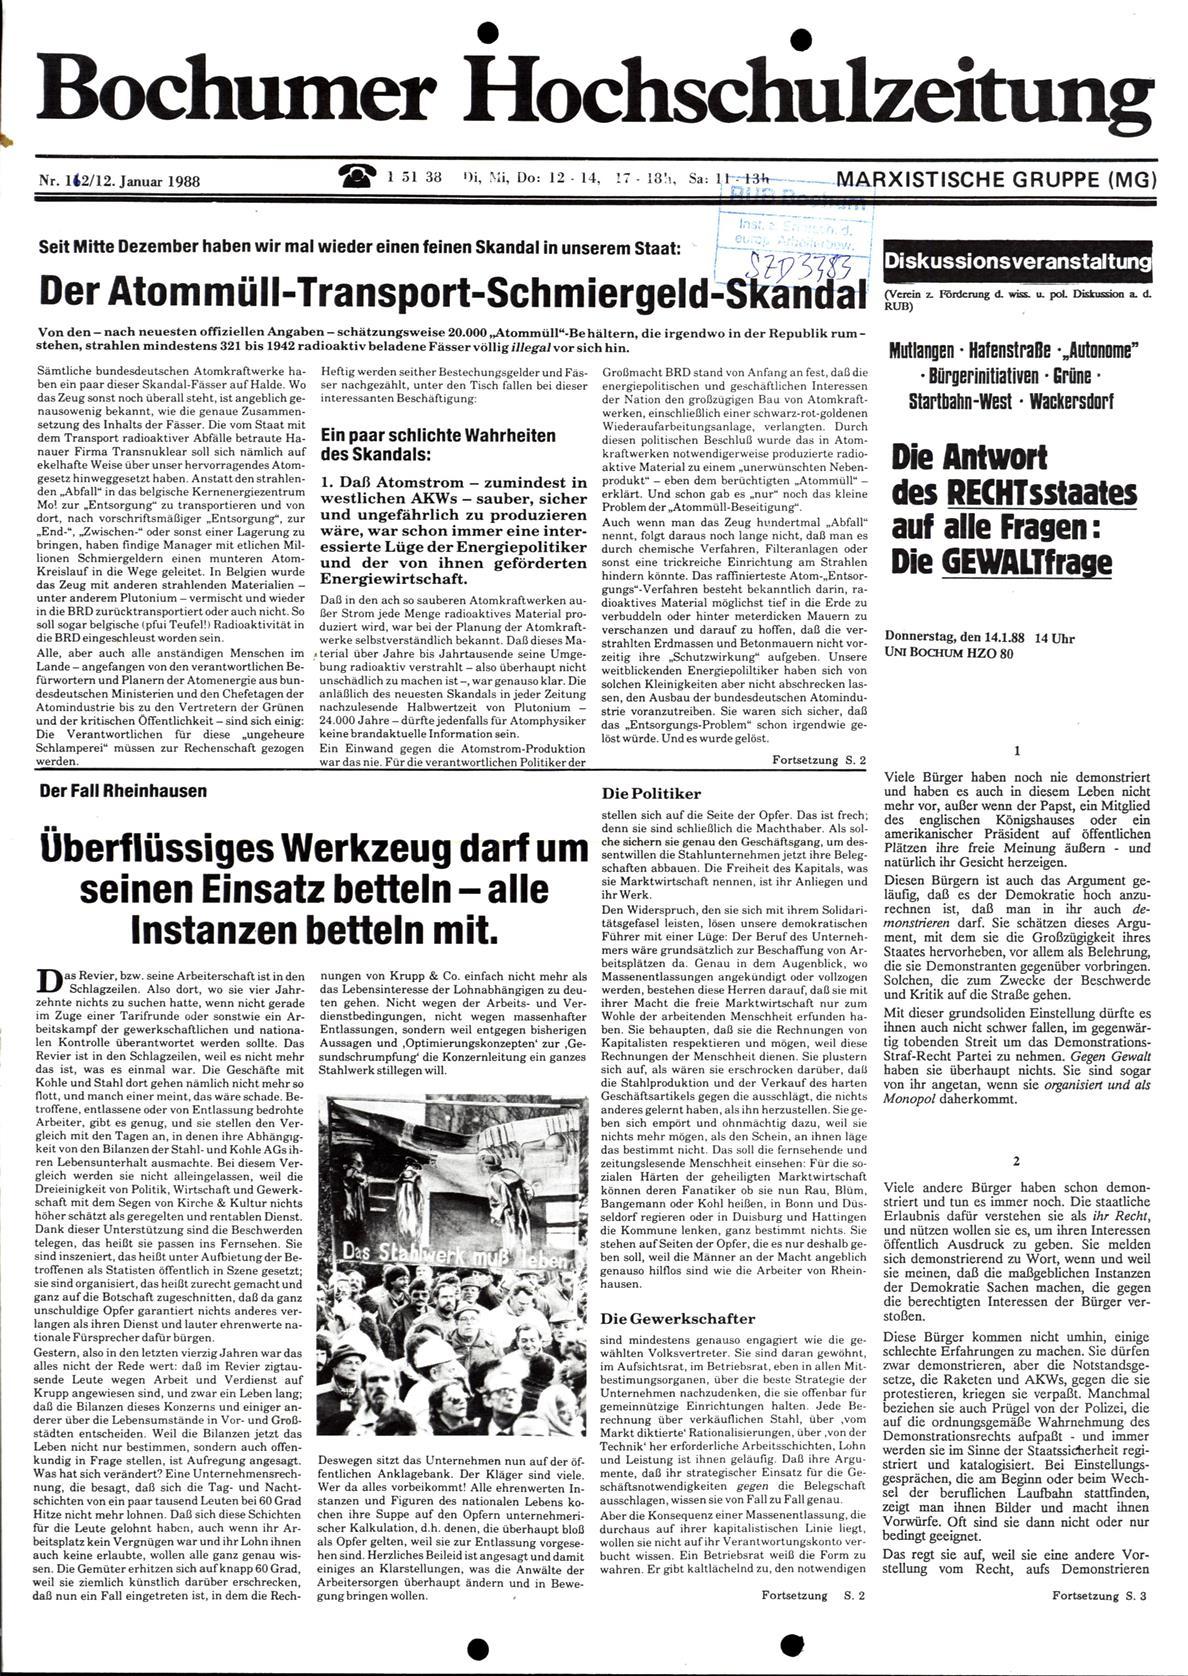 Bochum_BHZ_19880112_162_001